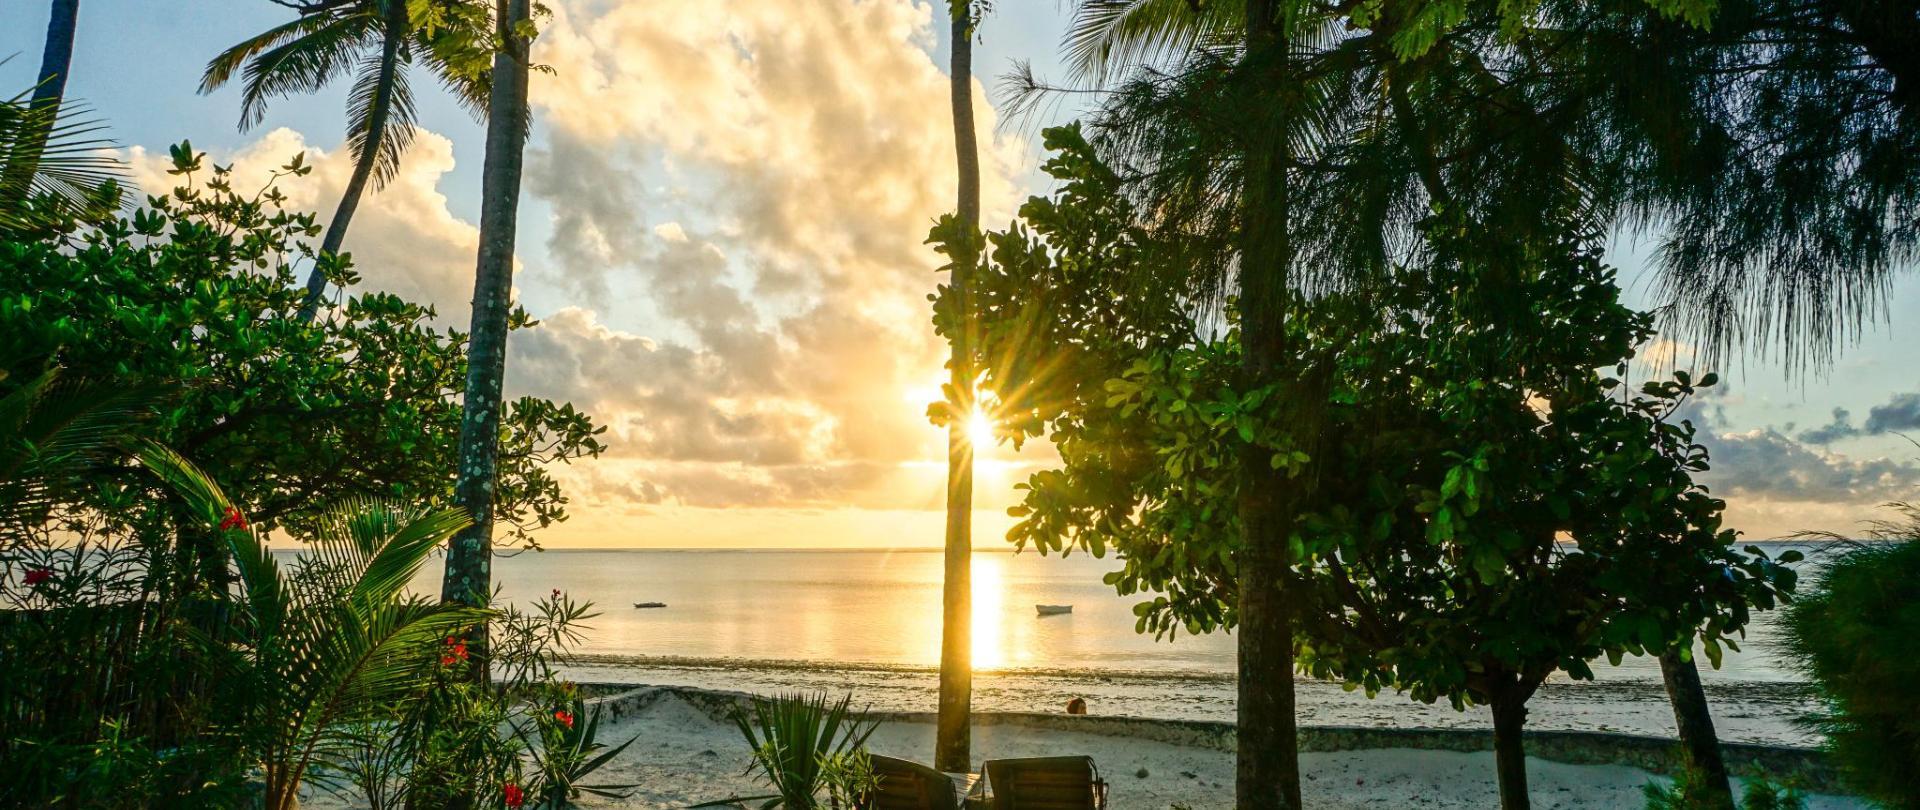 Indigo Beach Zanzibar Sunrise